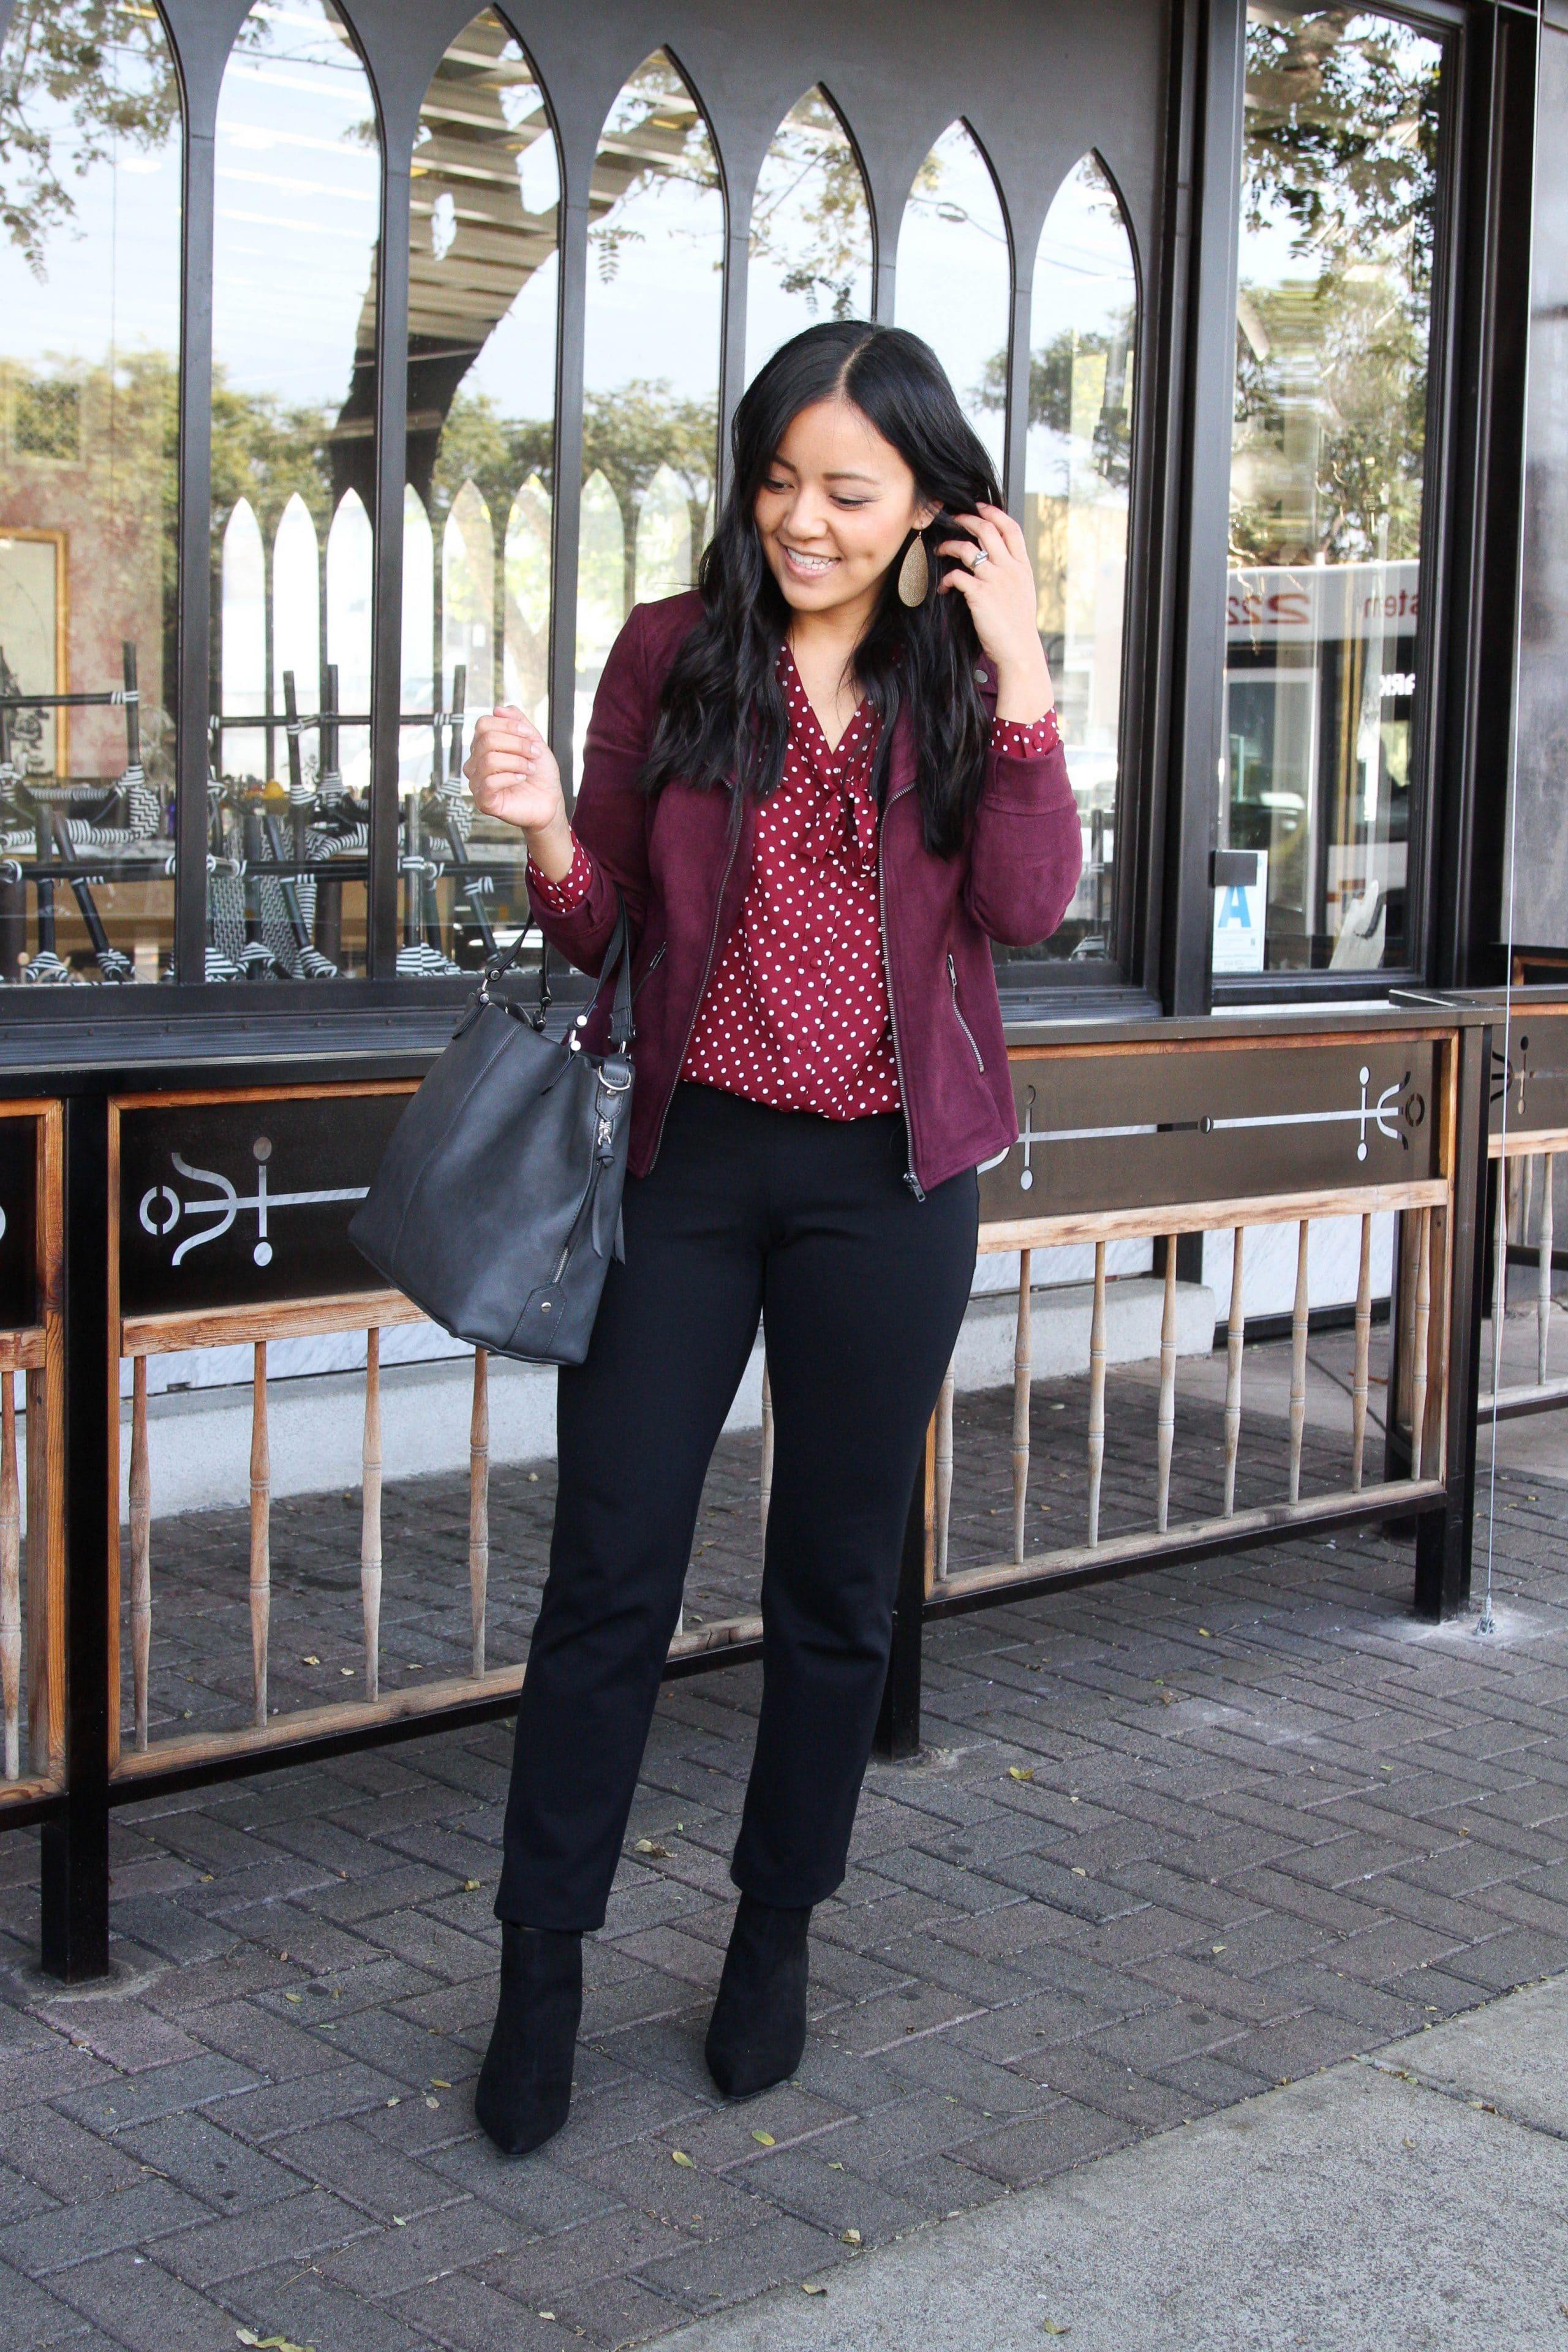 business casual + maroon moto jacket + maroon polka dot top + black straight pants + black booties + grey purse